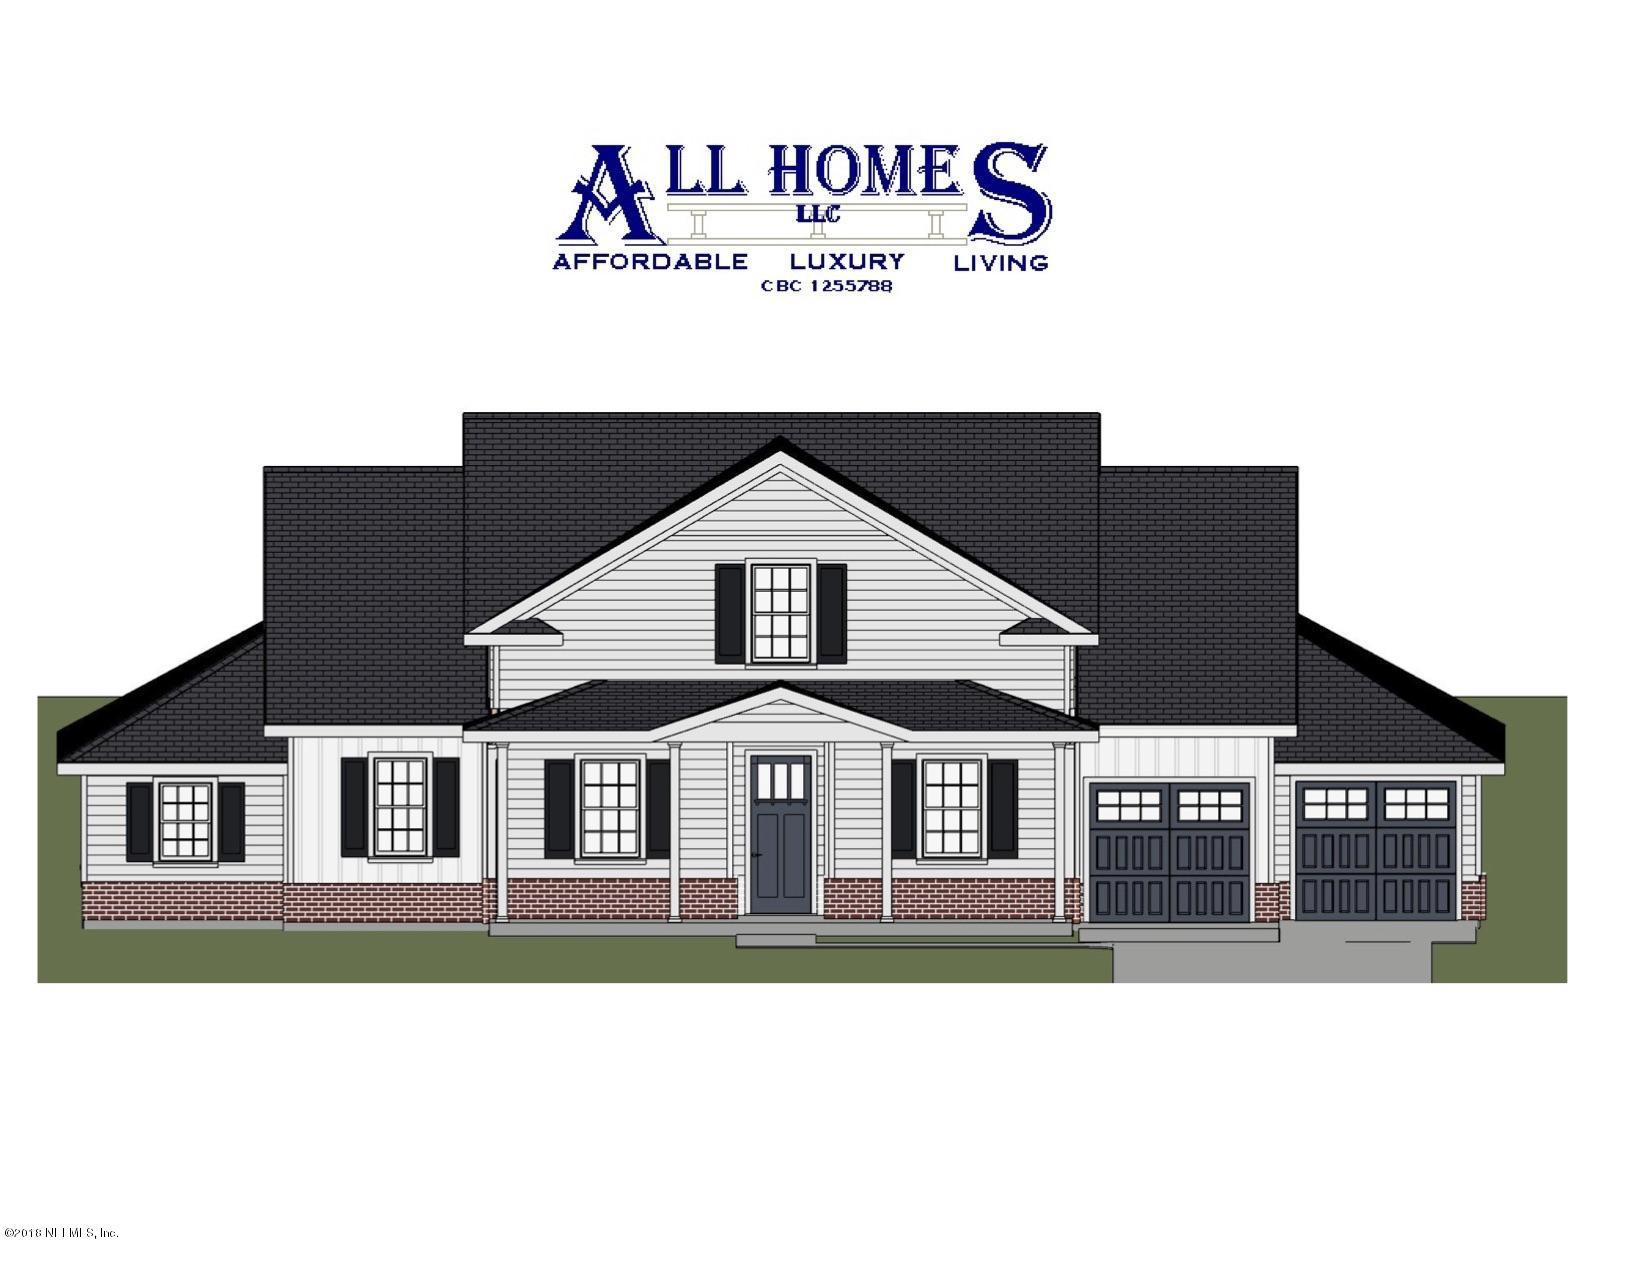 1868 ORANGE COVE, JACKSONVILLE, FLORIDA 32259, 4 Bedrooms Bedrooms, ,3 BathroomsBathrooms,Residential - single family,For sale,ORANGE COVE,958169